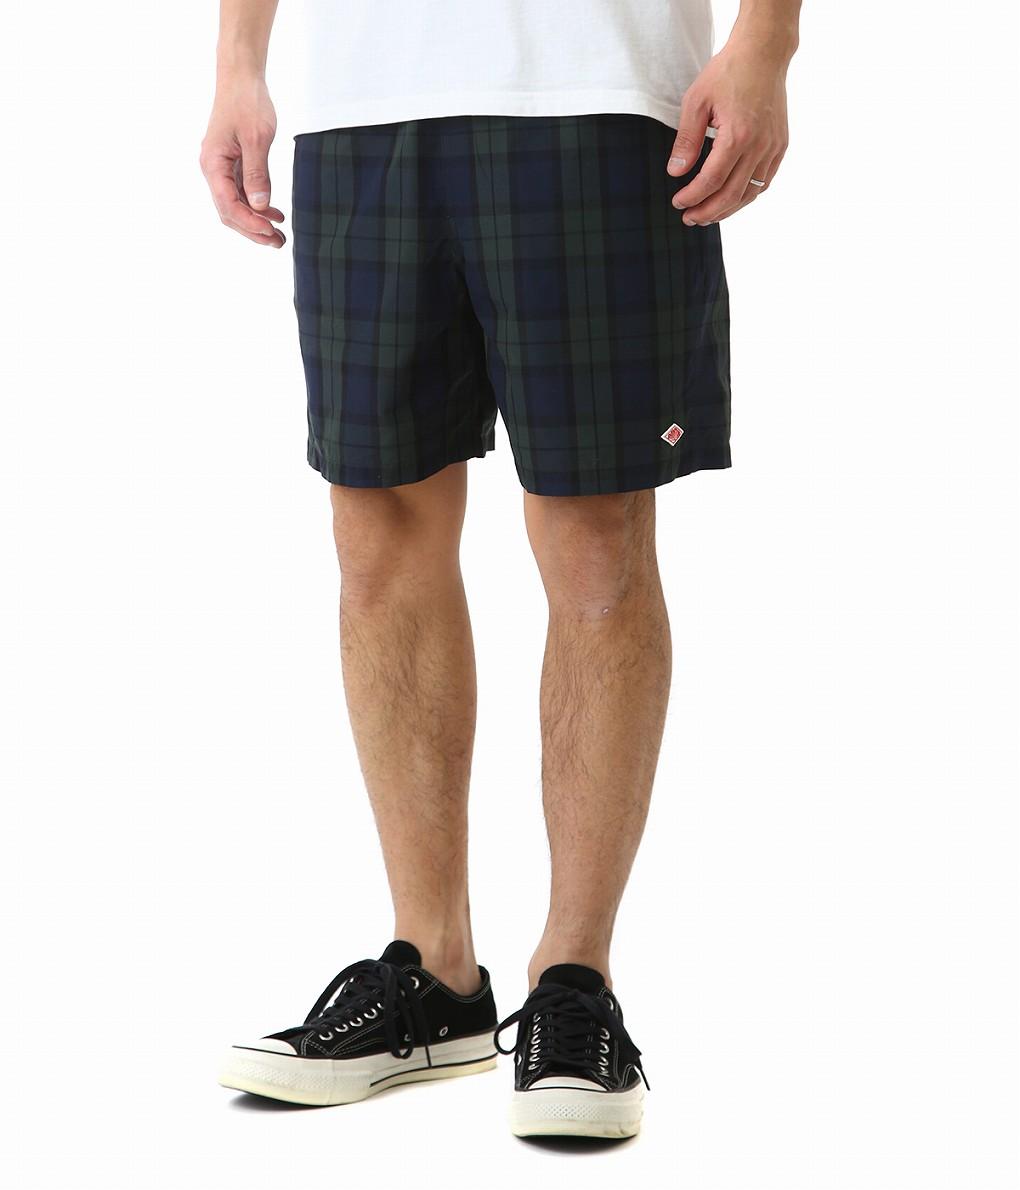 DANTON / ダントン : NYLON TAFFETA CHECK SHORT PANTS : ダントン ナイロン チェック ショート パンツ メンズ : JD-2603-NPL 【STD】